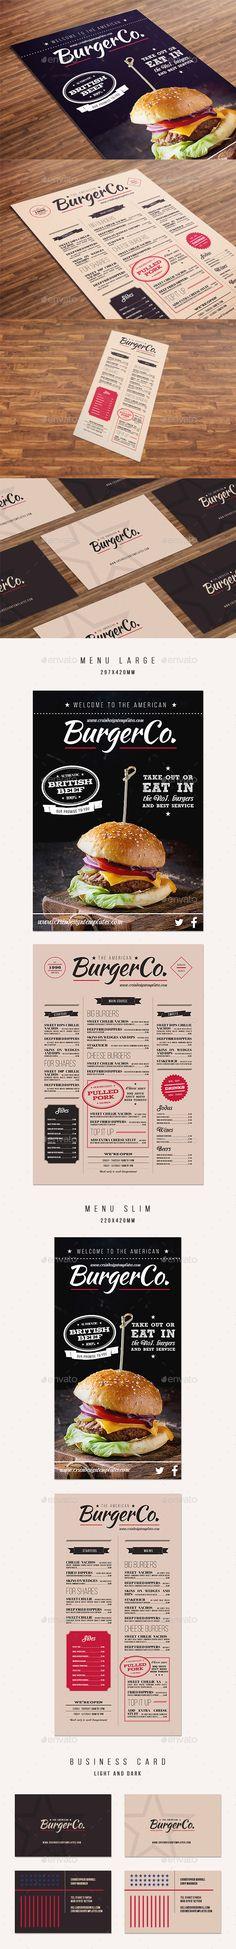 American Burger Menu Template #design Buy Now: http://graphicriver.net/item/american-burger-menu/12795042?ref=ksioks